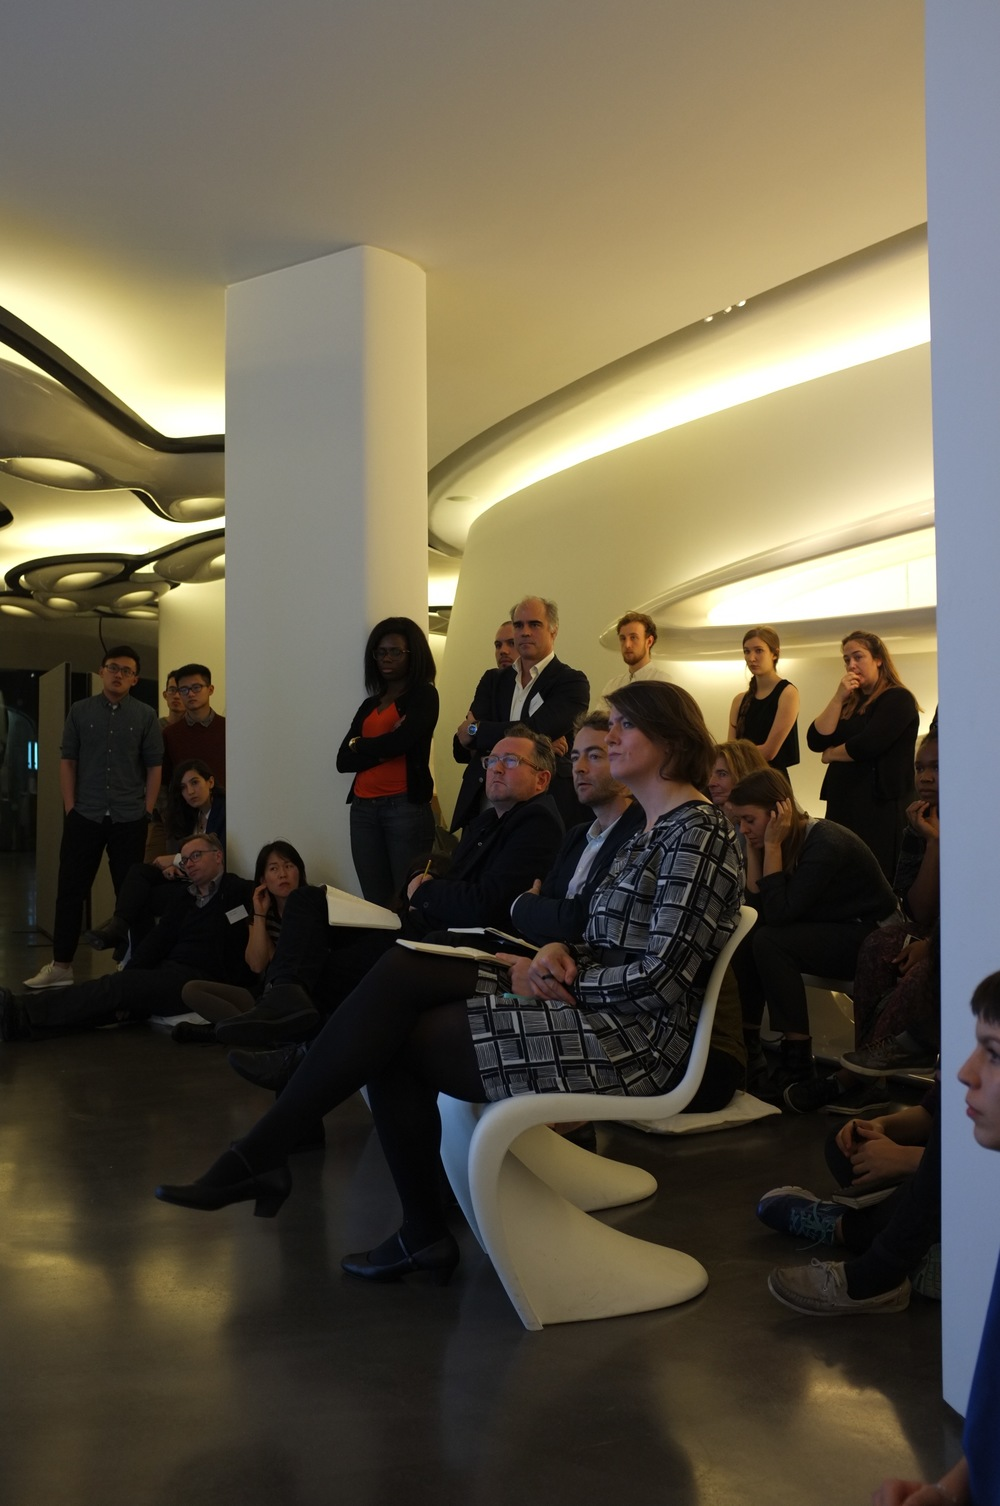 The jury (R to L) Patrick Lynch, Nicholas Gilliland, Karin Templin